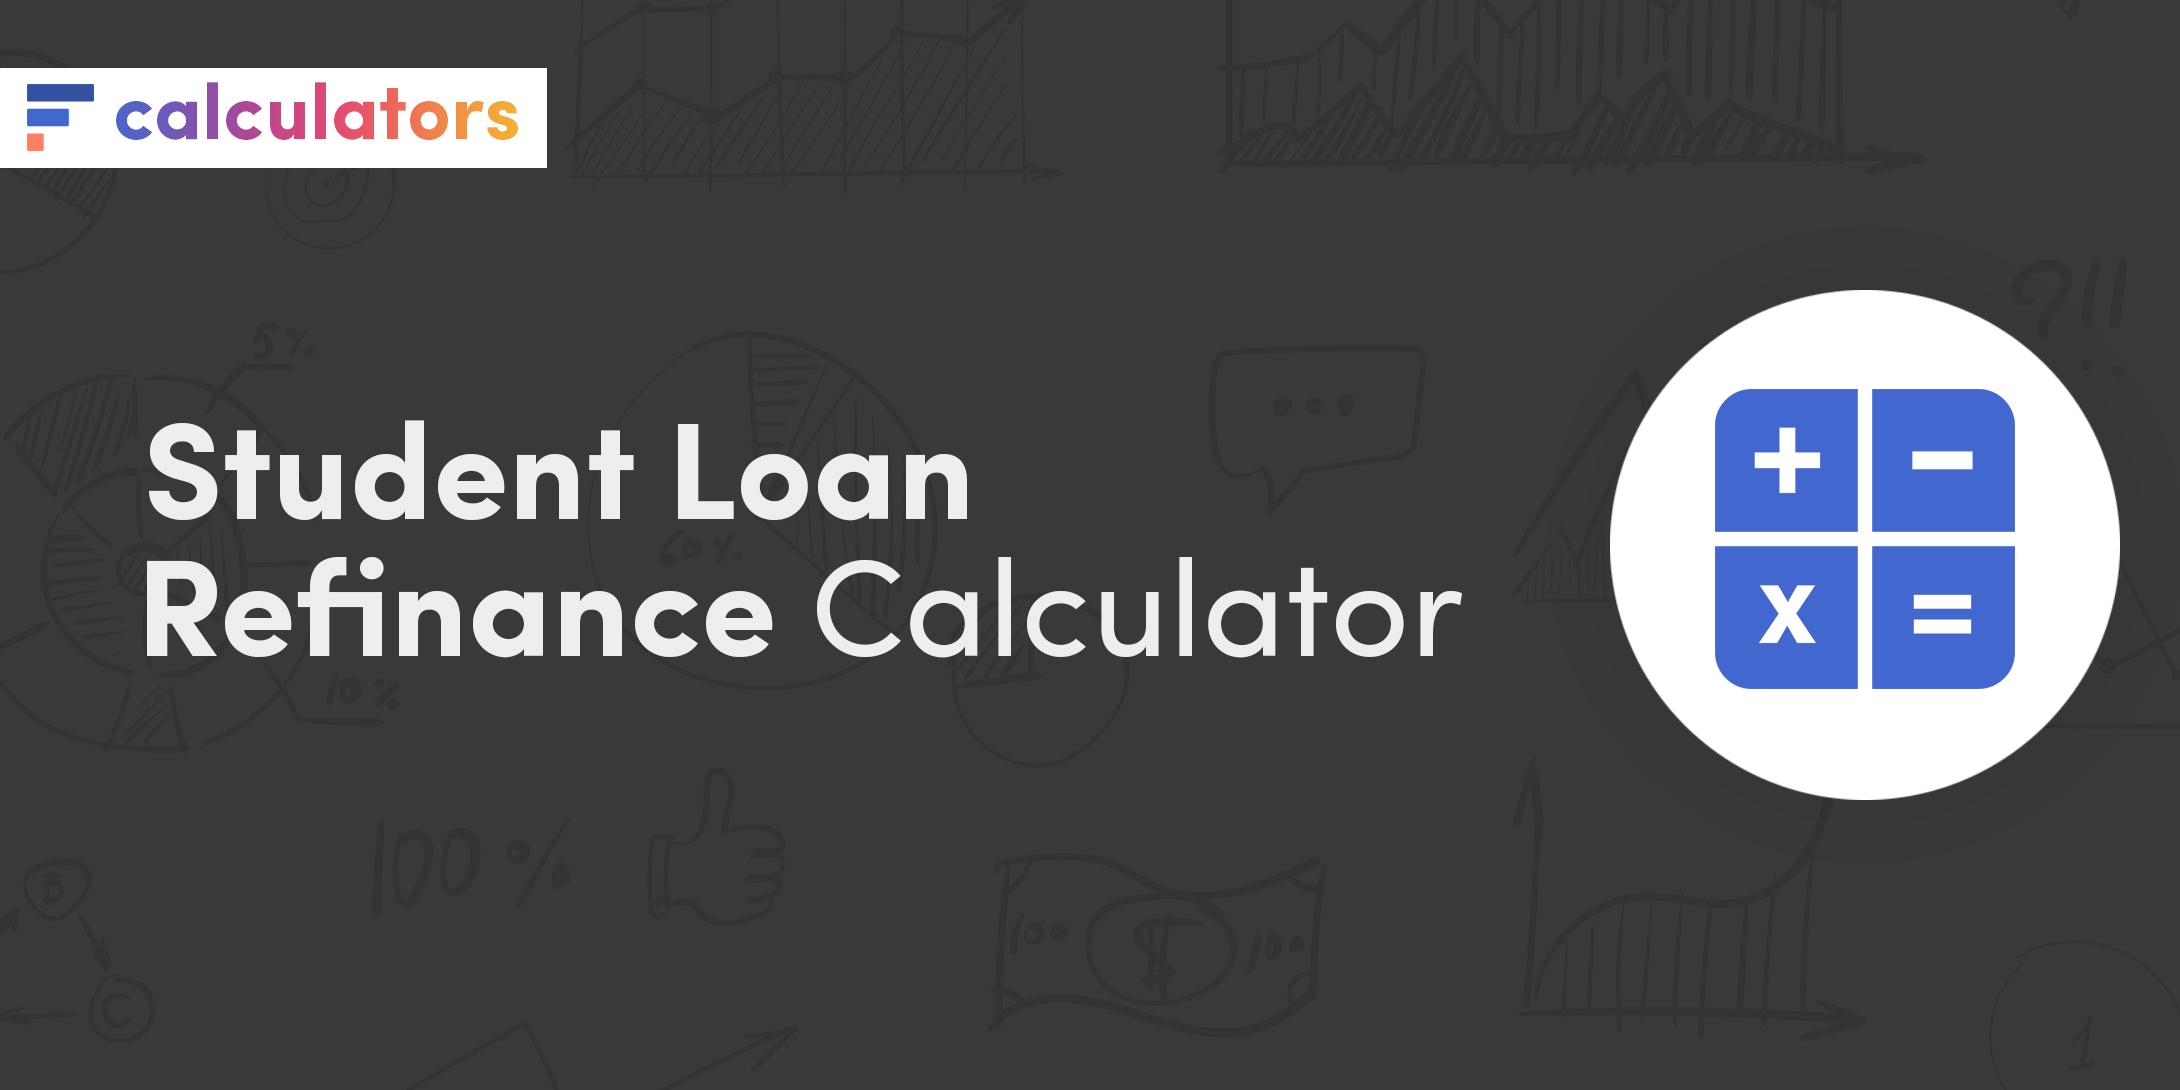 Student loan refinance calculator